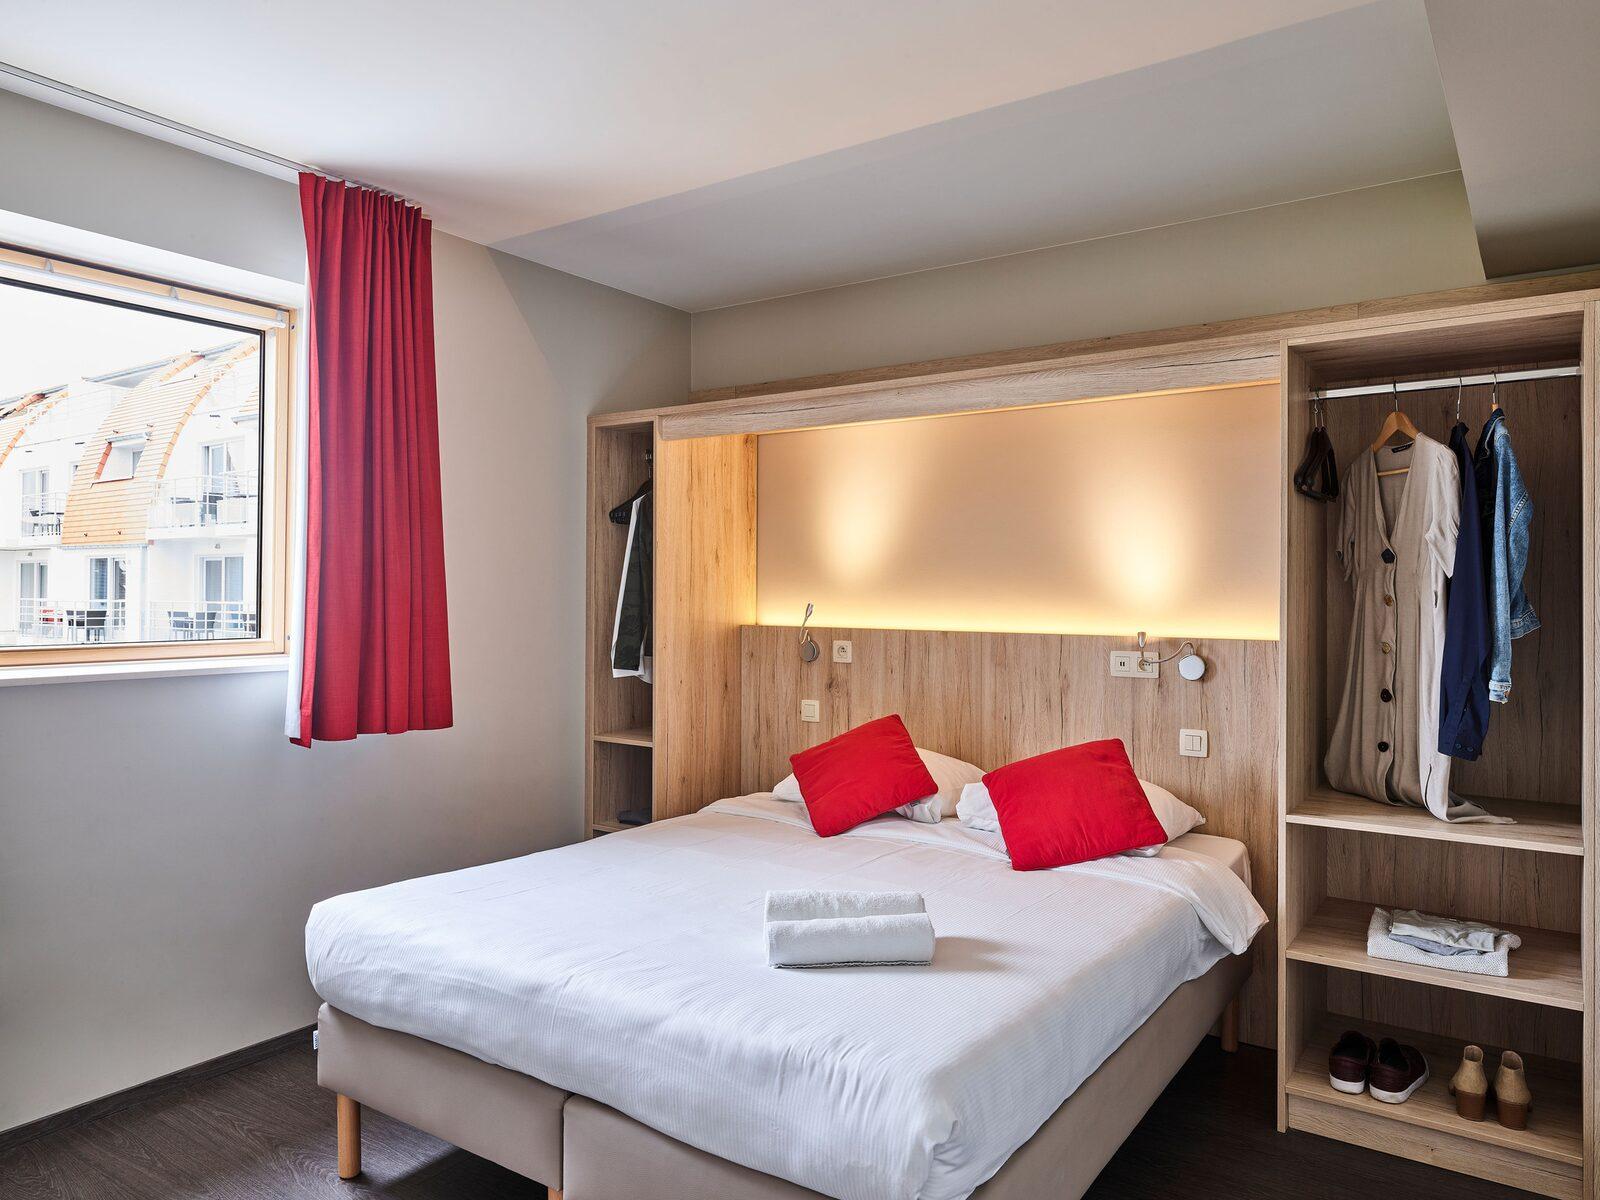 Comfort Suite - 6p | 2 Chambres à coucher - Coin couchage